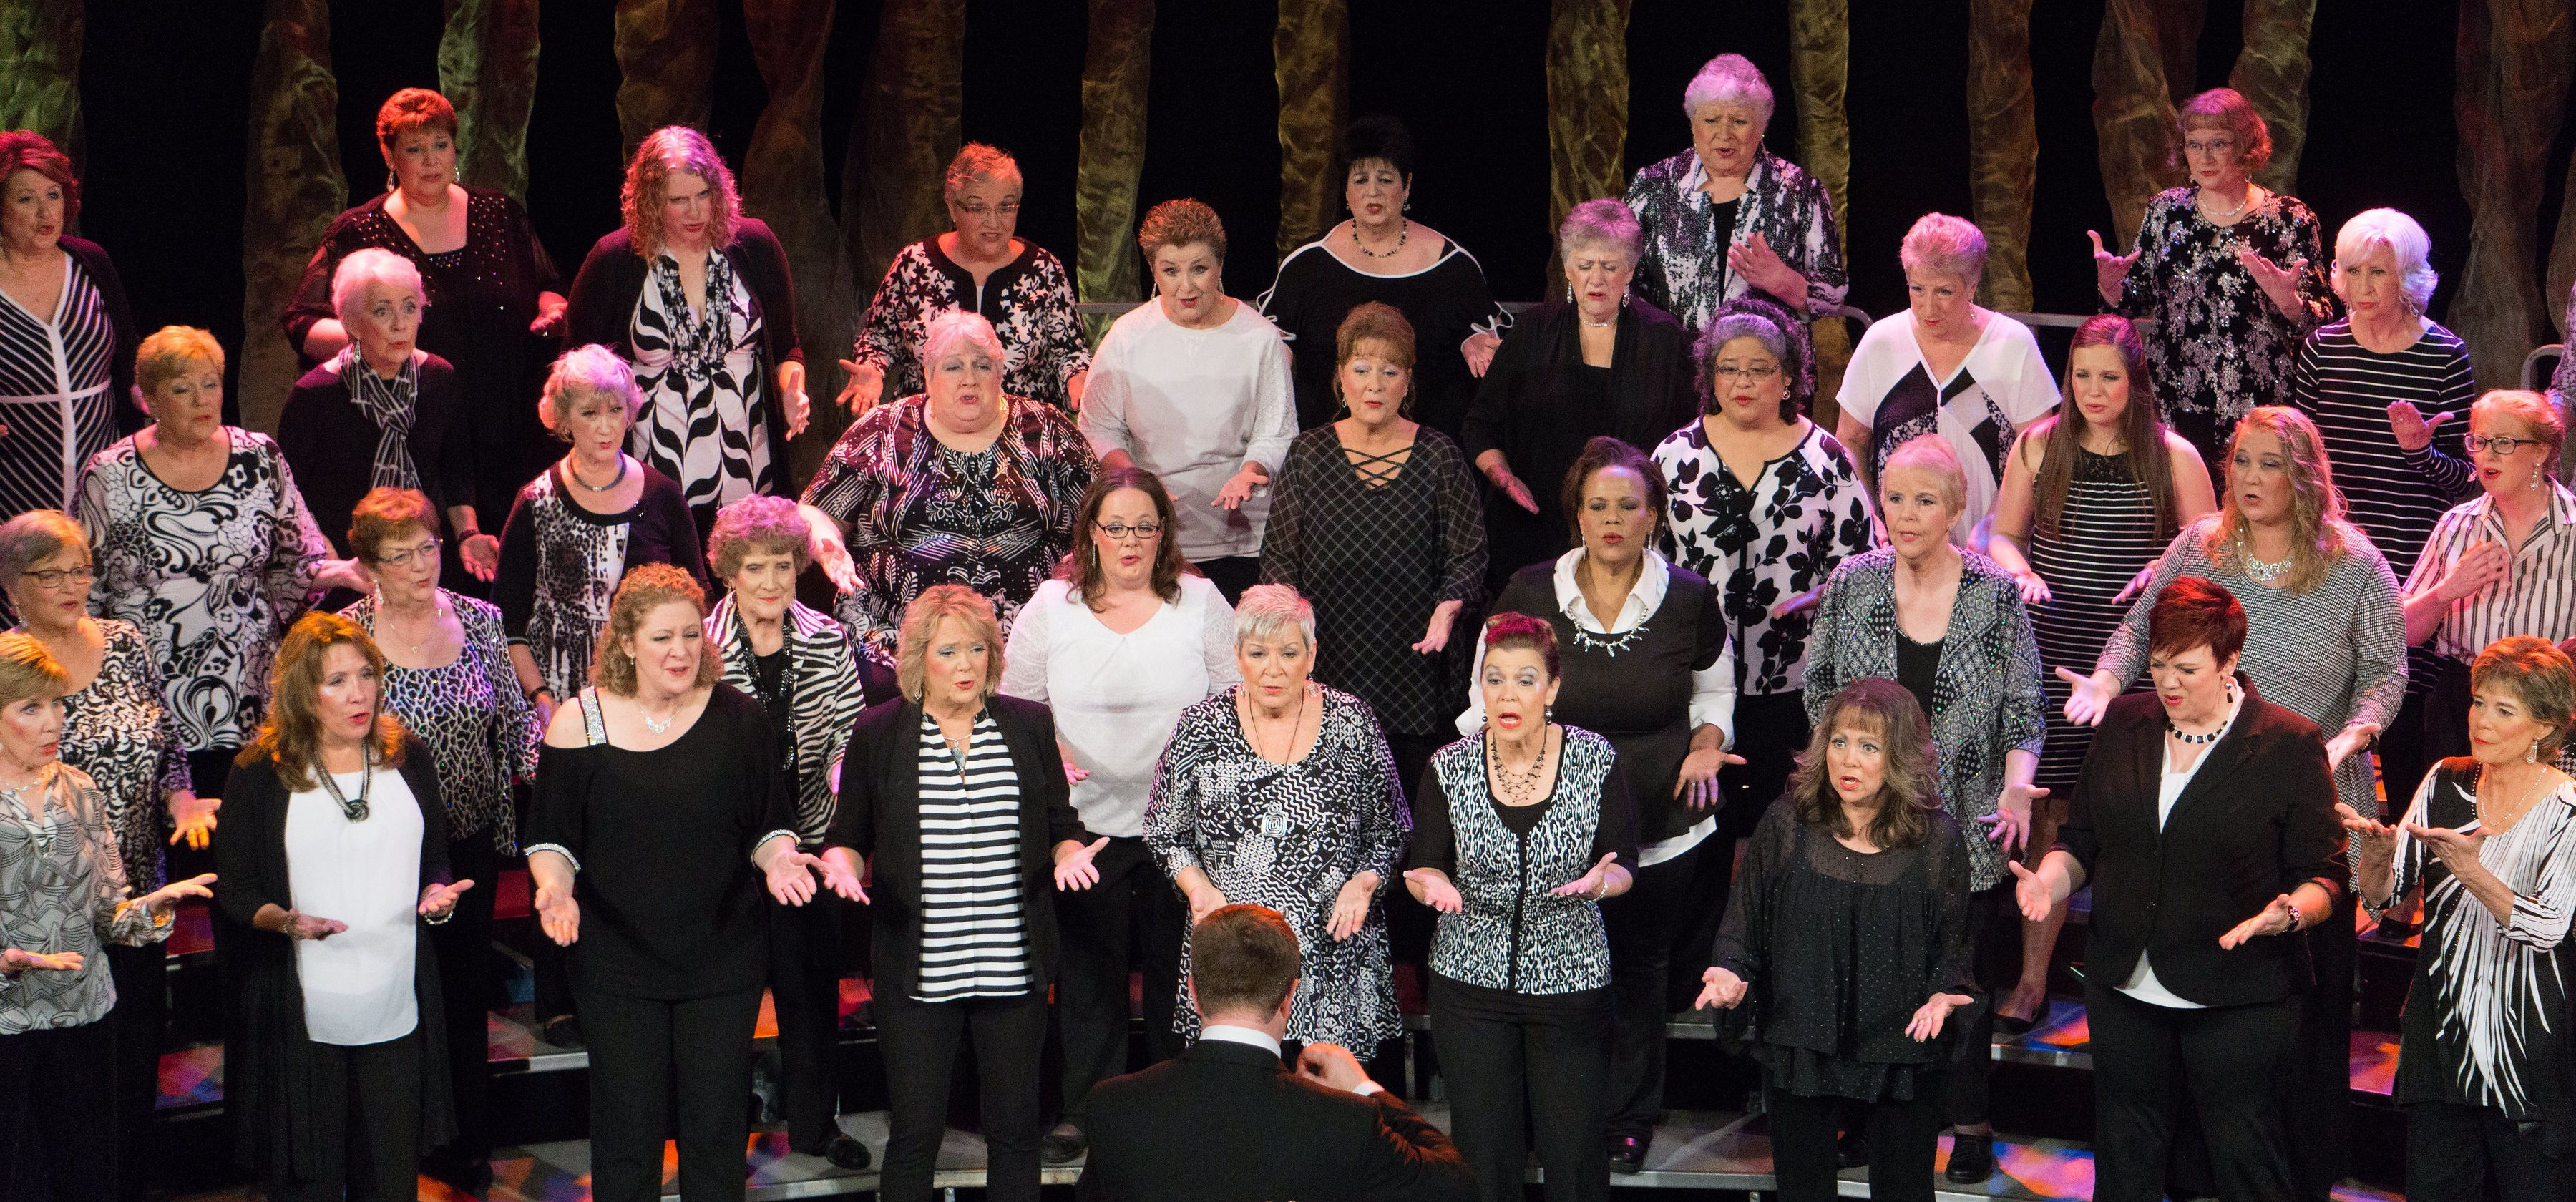 Harmony Central Sweet Adeline Chorus